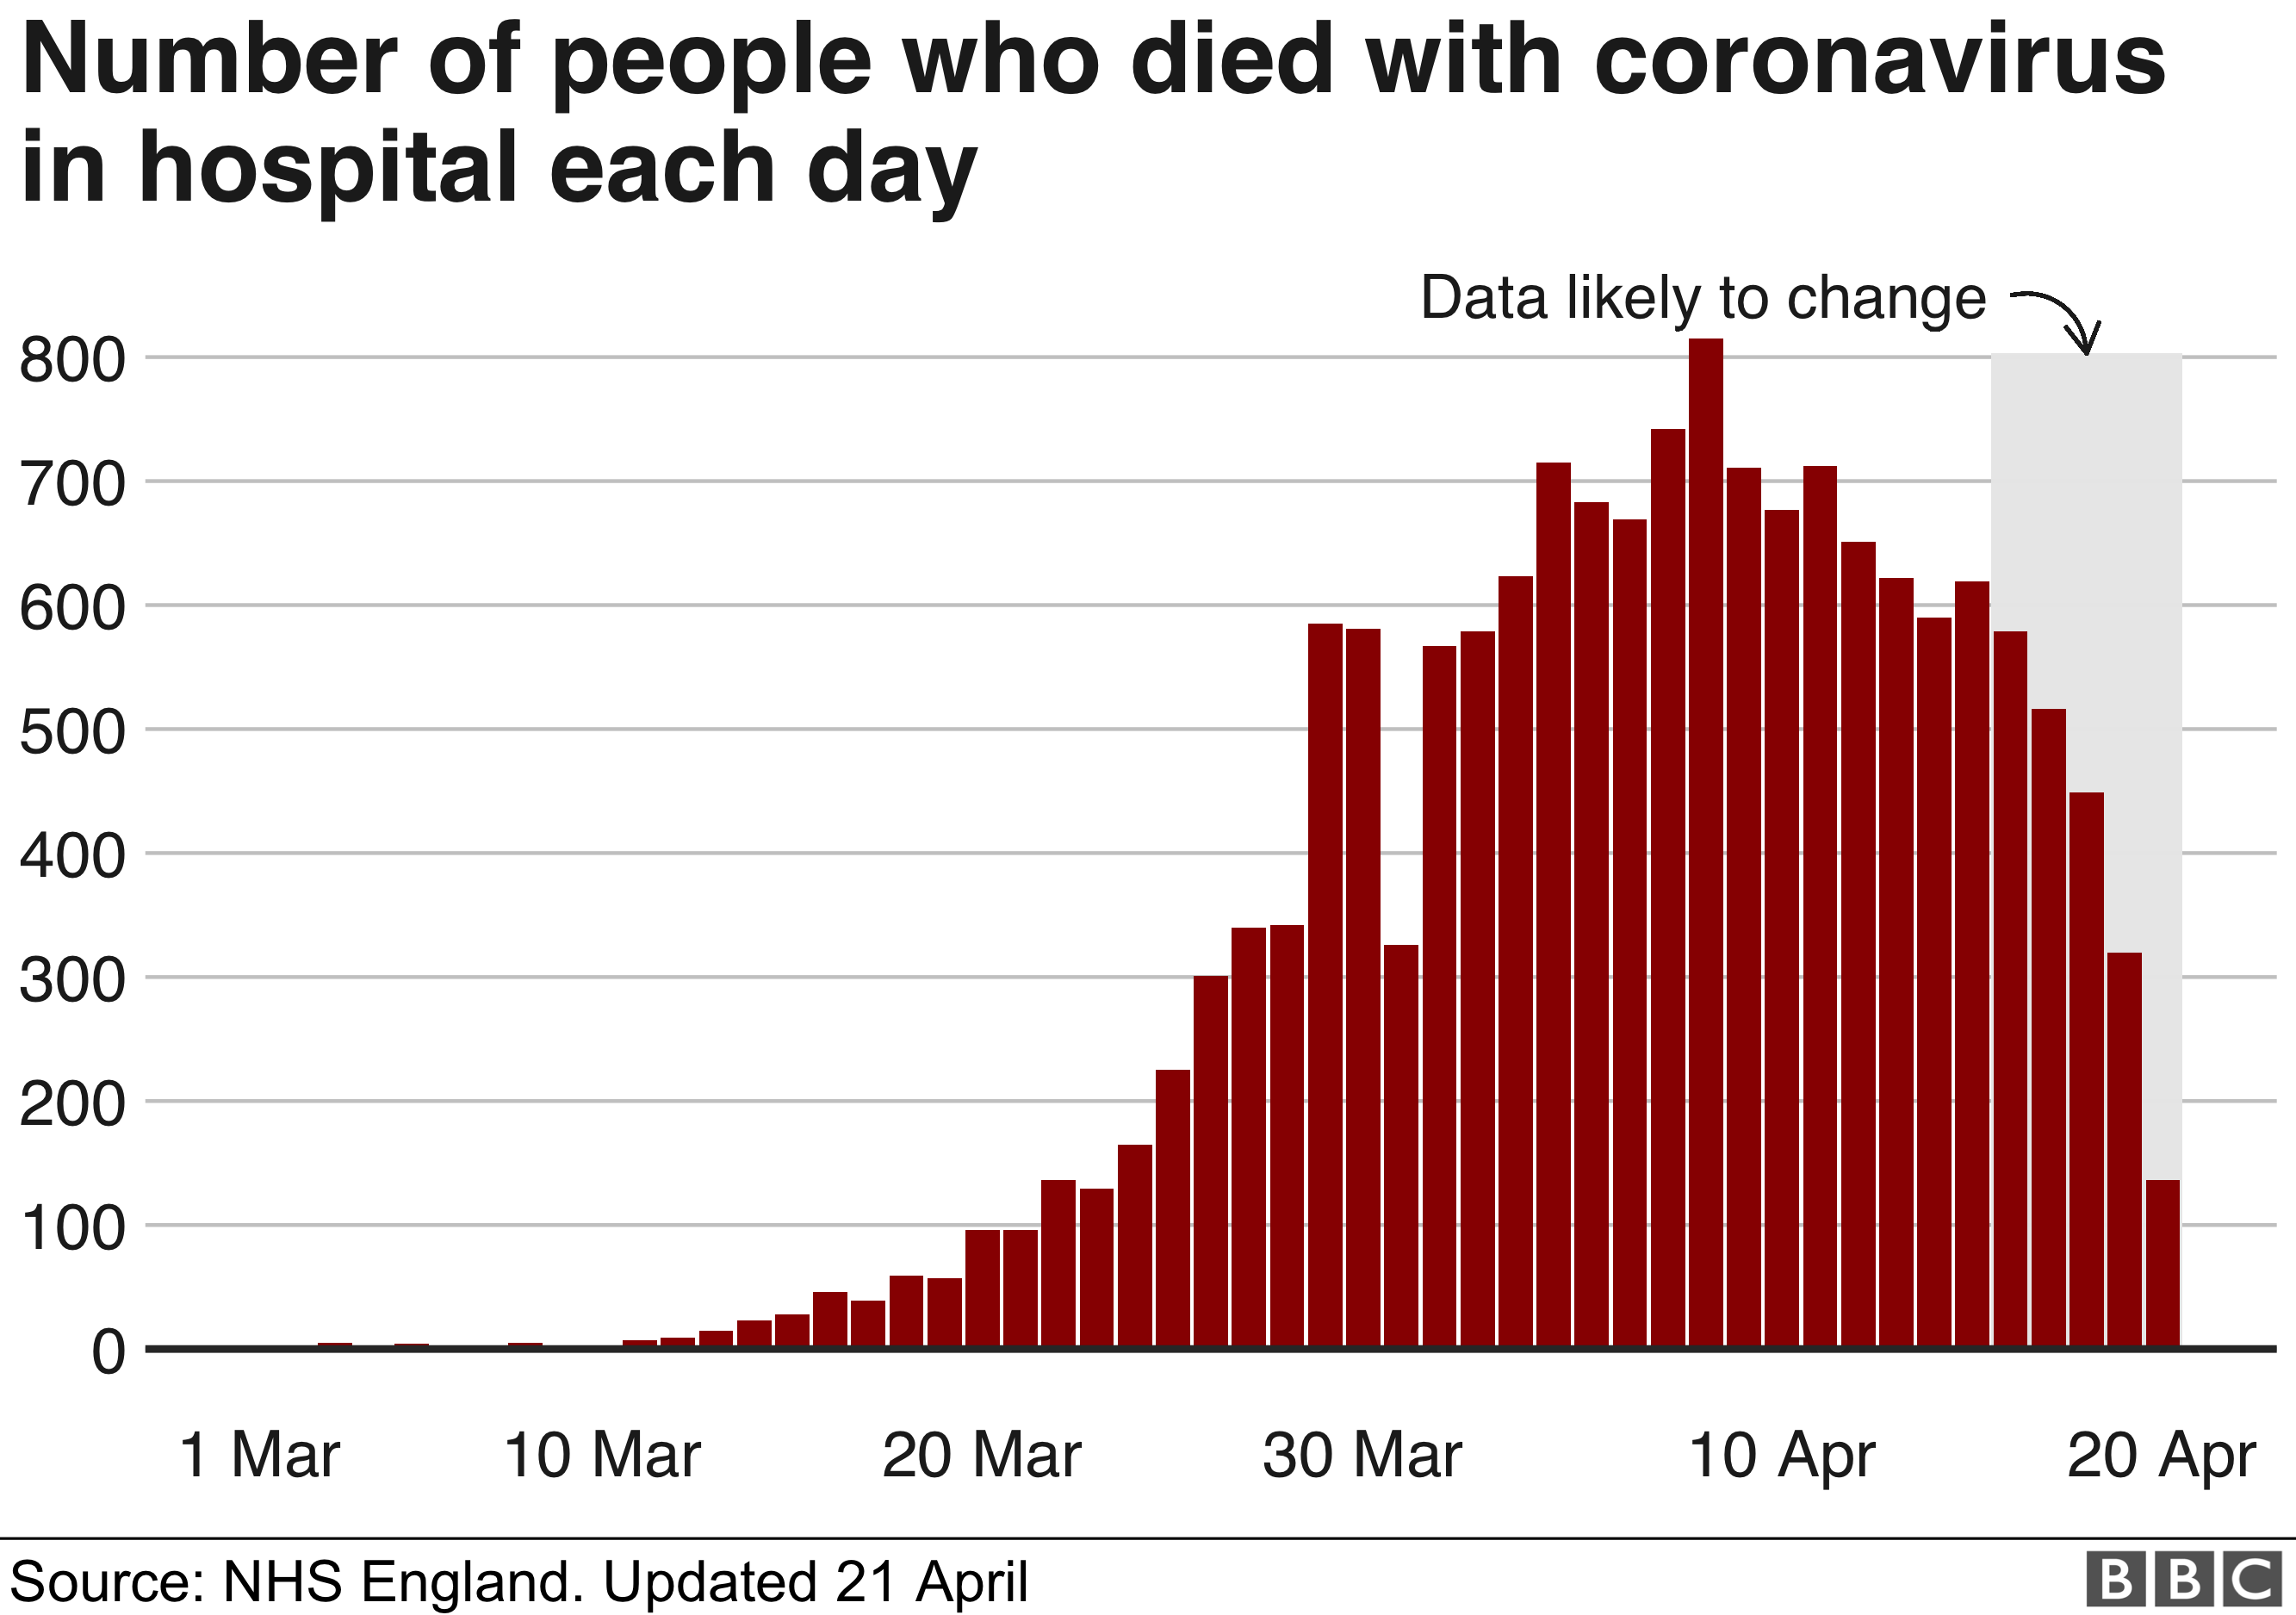 Coronavirus Deaths At 20 Year High But Peak May Be Over Bbc News